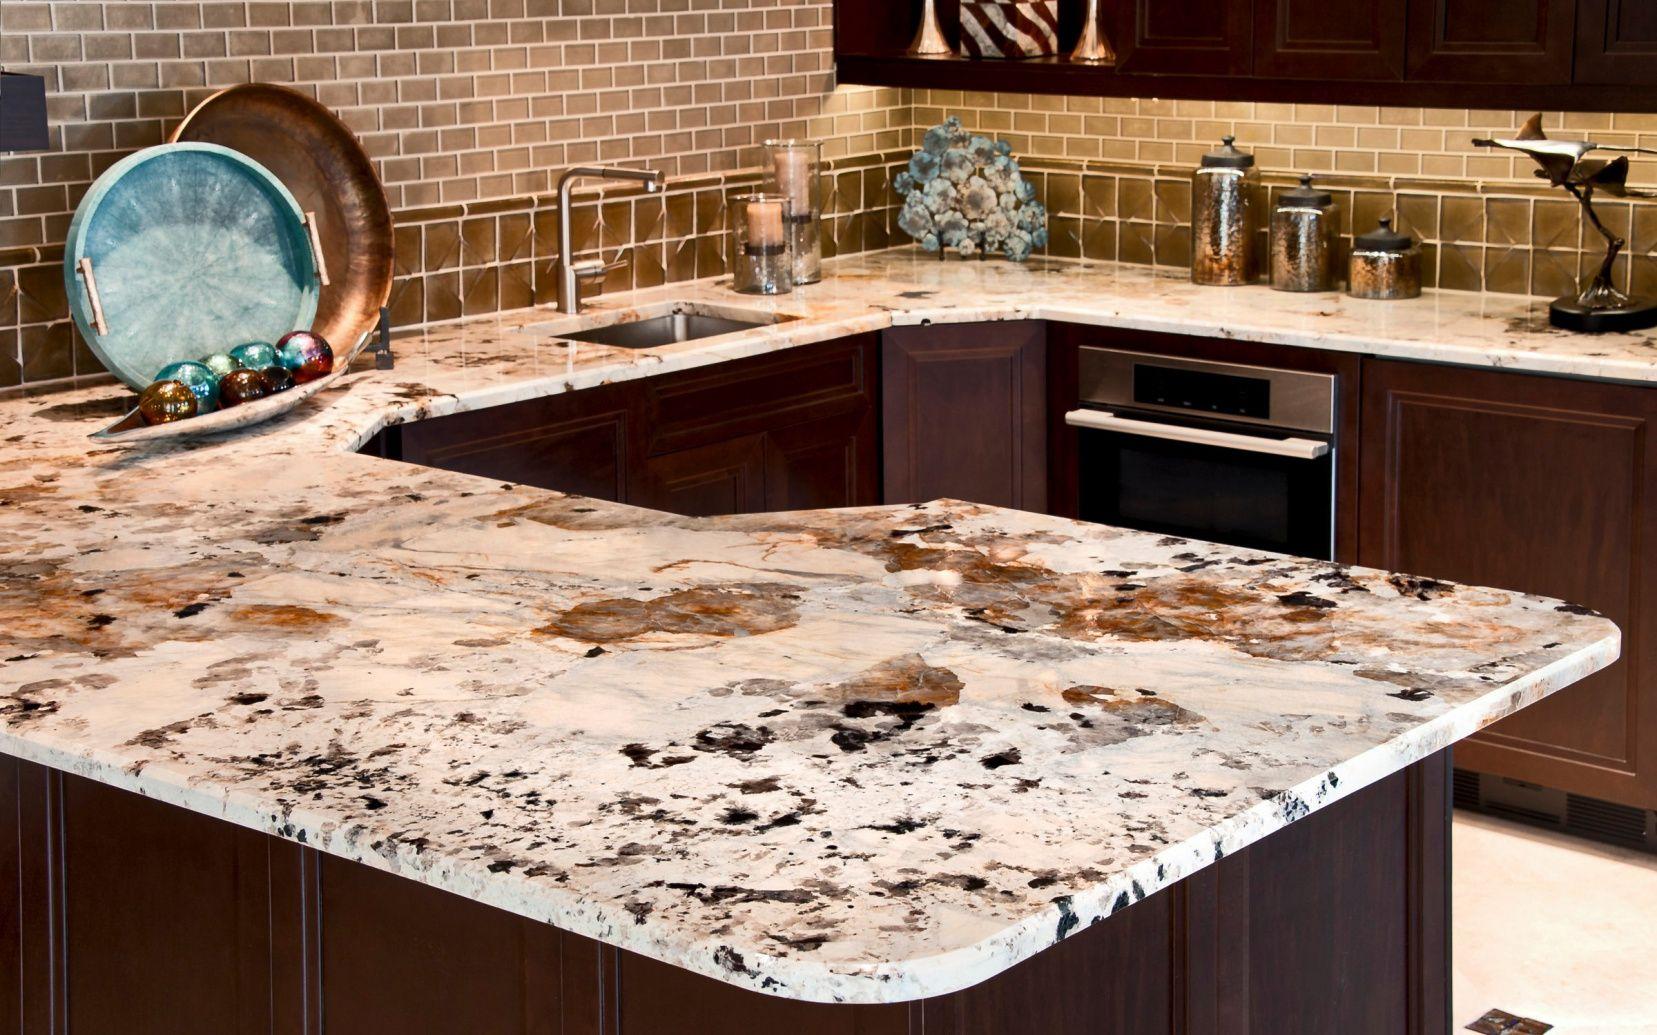 99 Alpine White Granite Countertops Remodeling Ideas For Kitchens Check More At Http Mat Kitchen Nook Lighting Granite Kitchen Granite Countertops Kitchen